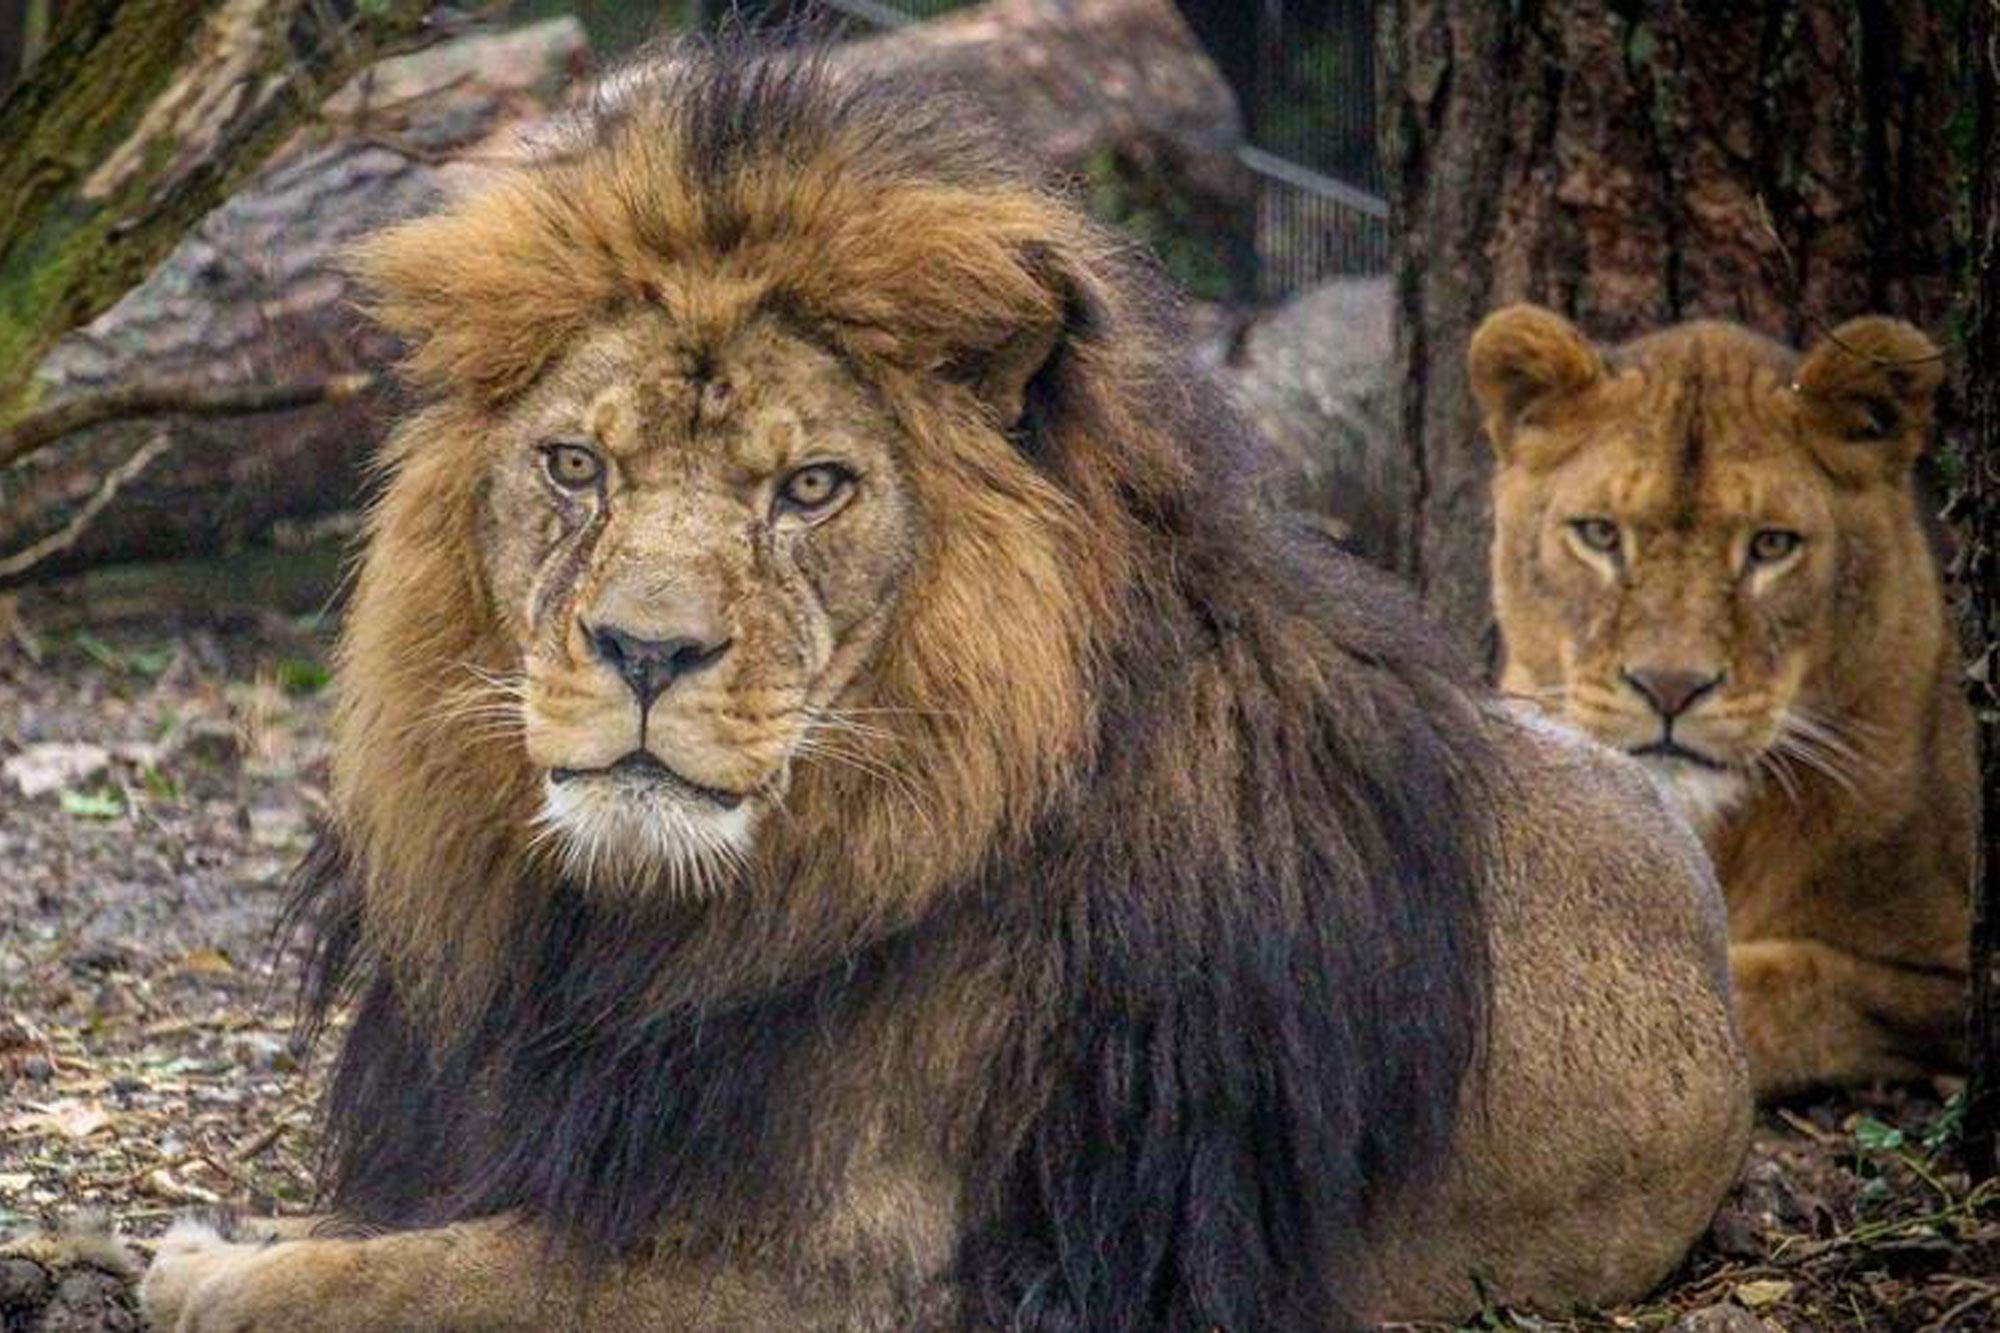 Barbary Lions at Port Lympne wildlife park, Kent